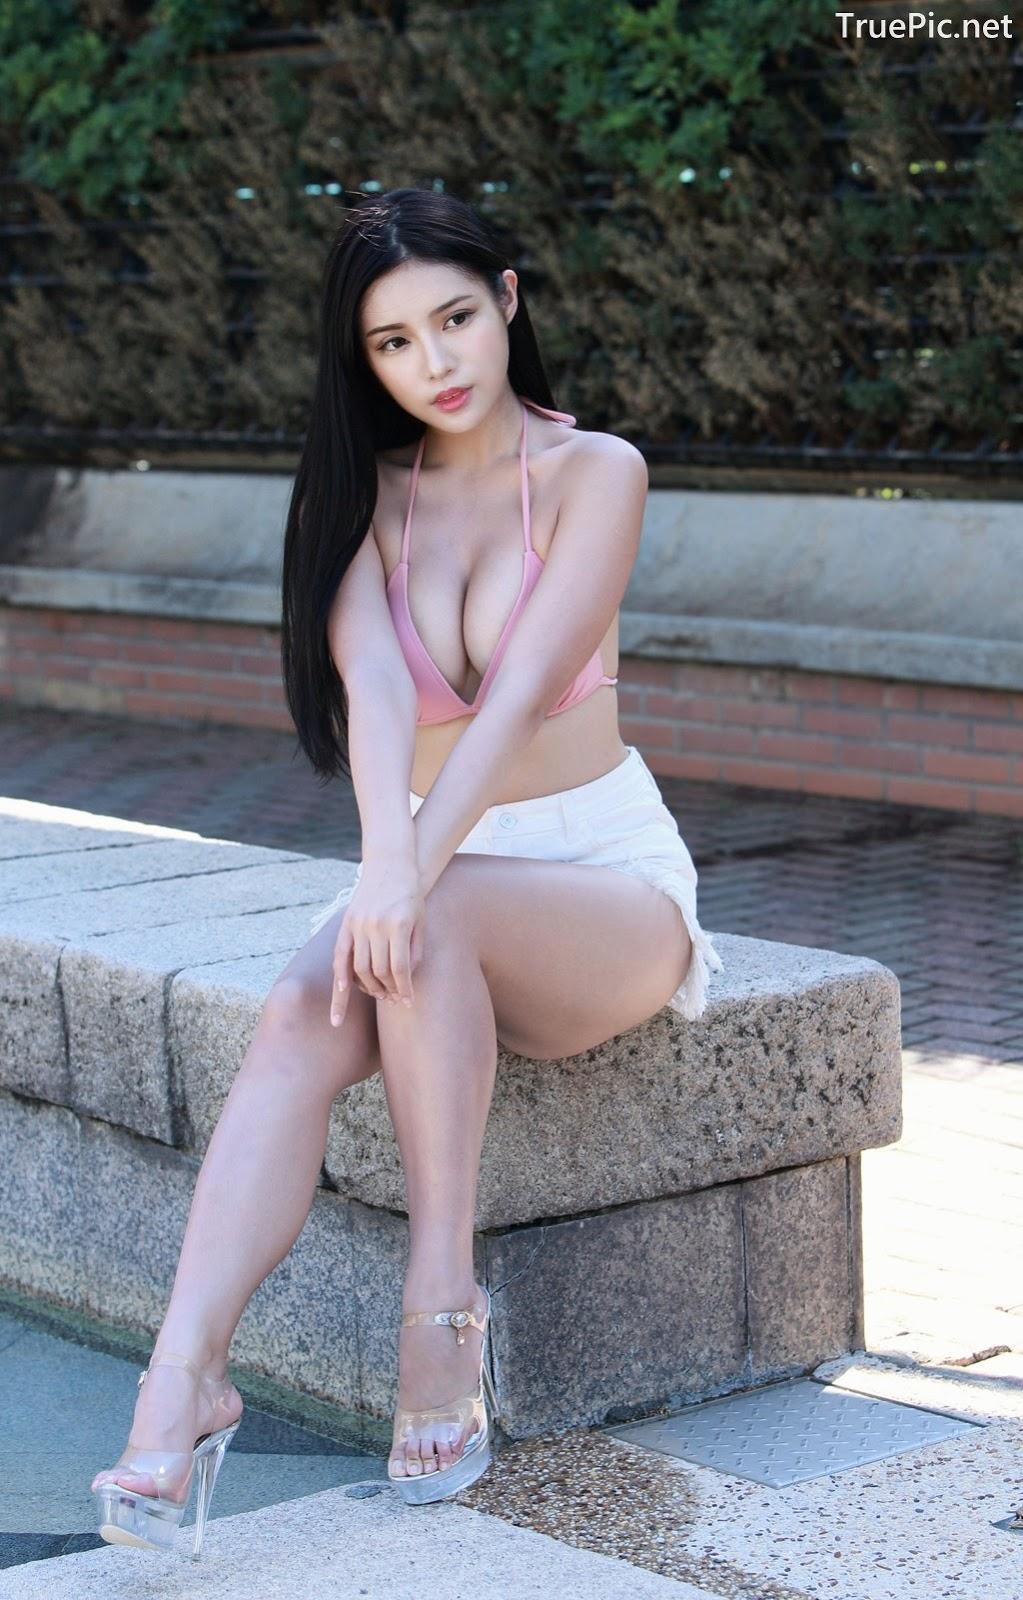 Image-Taiwanese-Model–莊舒潔-ViVi–Hot-Pink-Bikini-Top-and-White-Short-Pants-TruePic.net- Picture-6